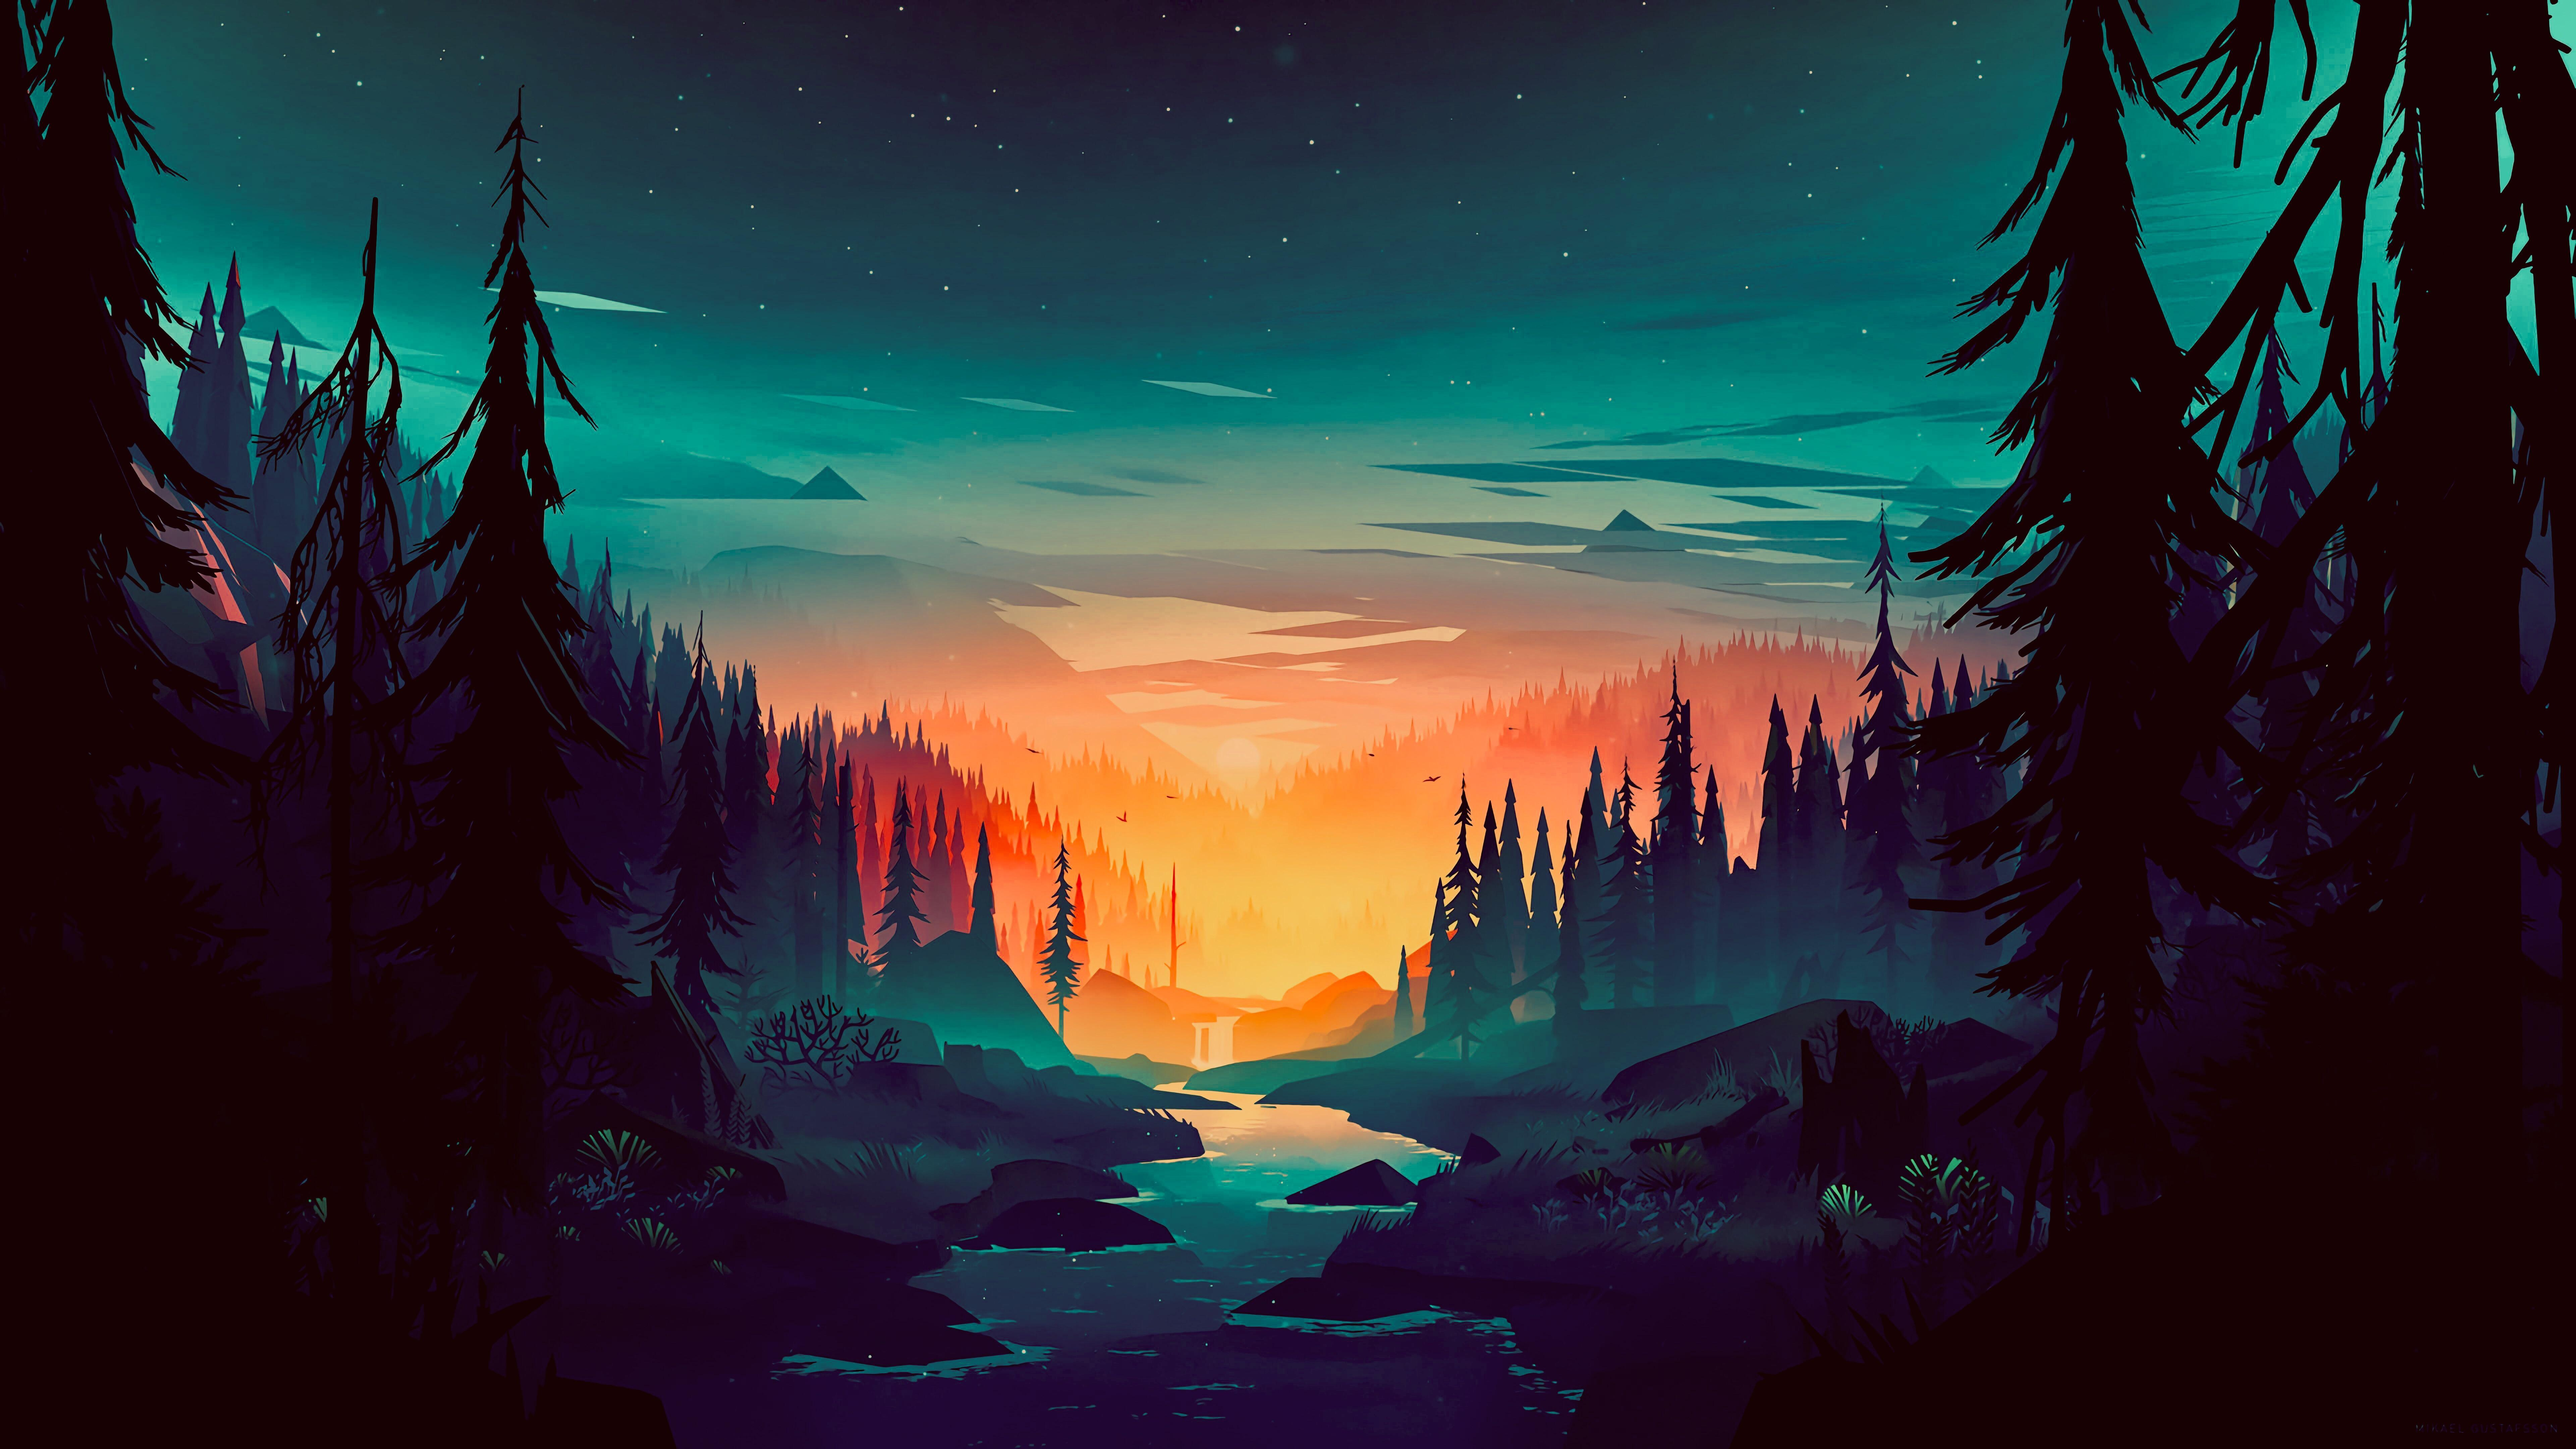 8k desktop wallpaper,sky,nature,natural environment,natural landscape,aurora